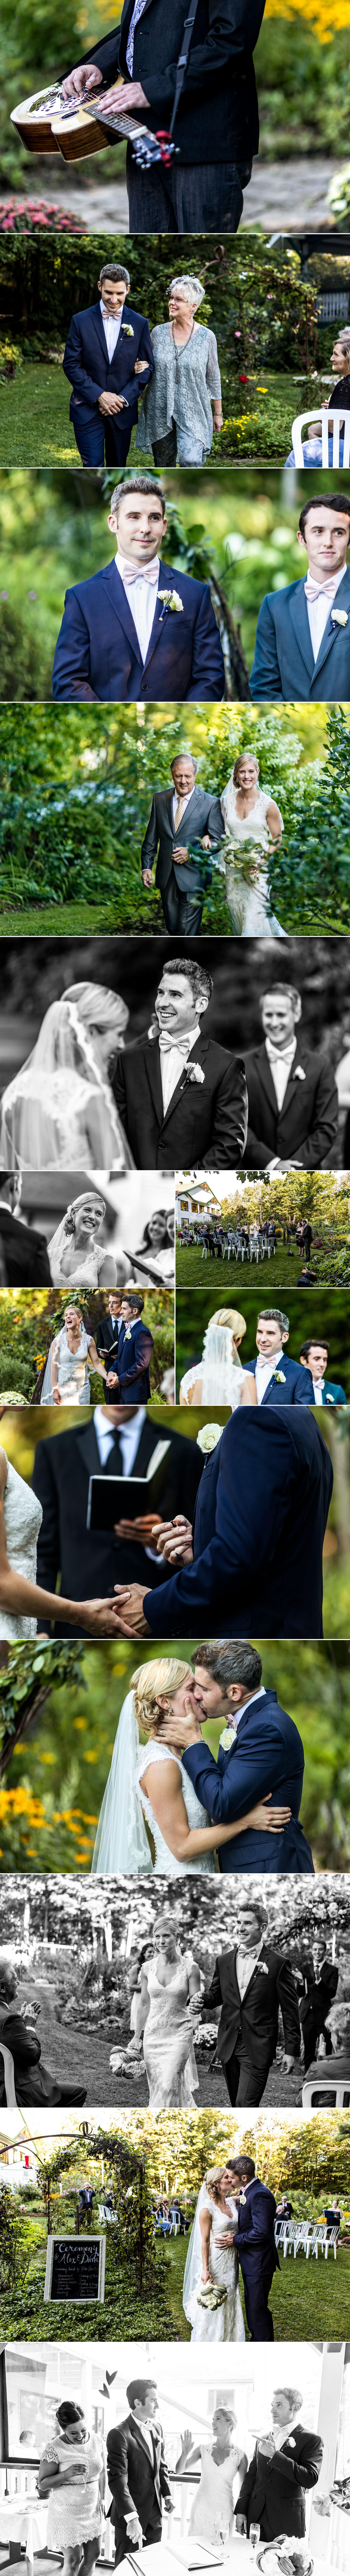 Outdoor cottage wedding ceremony photographs